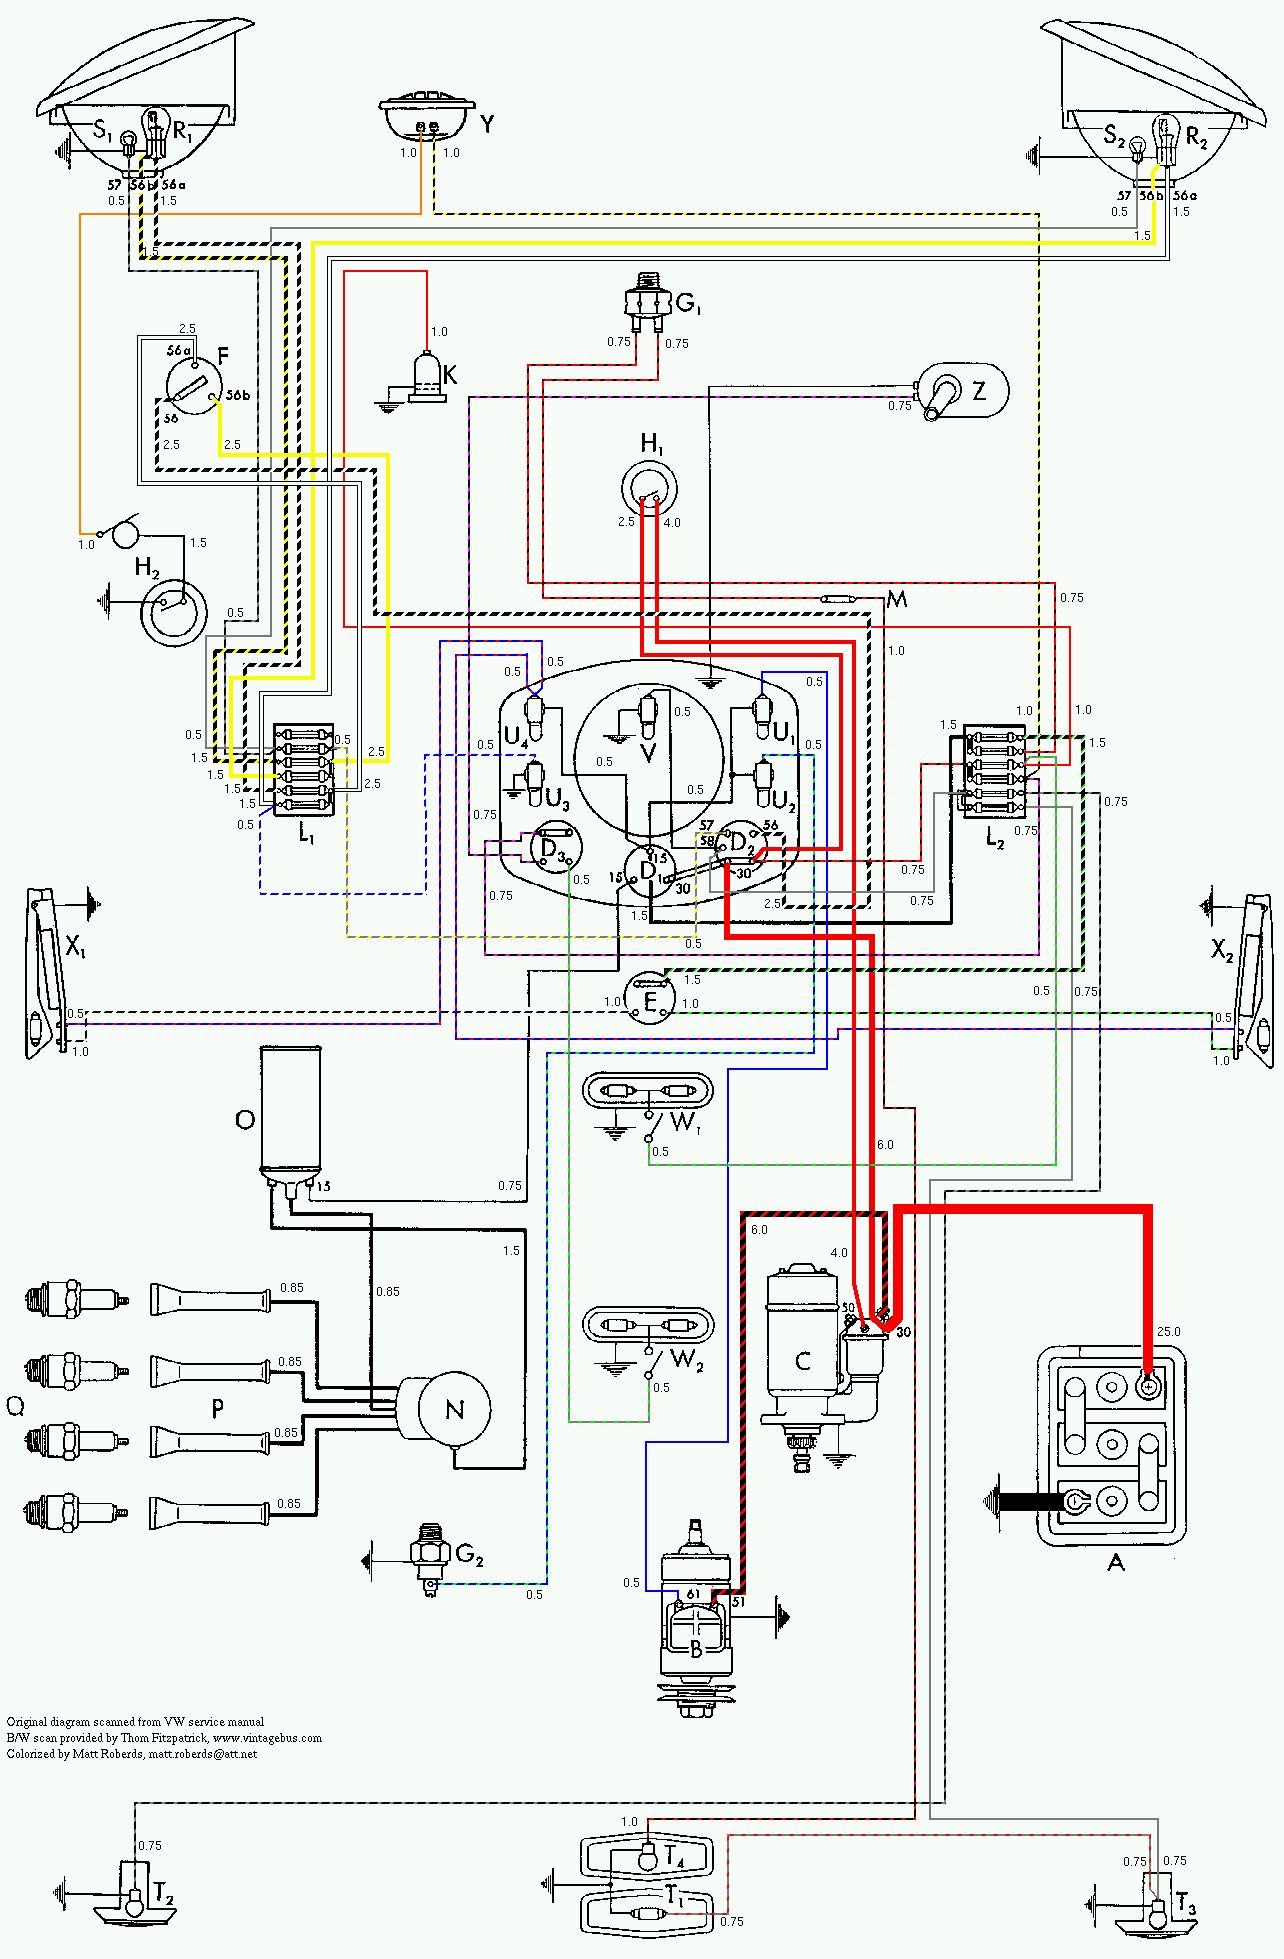 85 Chevrolet Steering Column Wiring Diagram 1950 To 1953